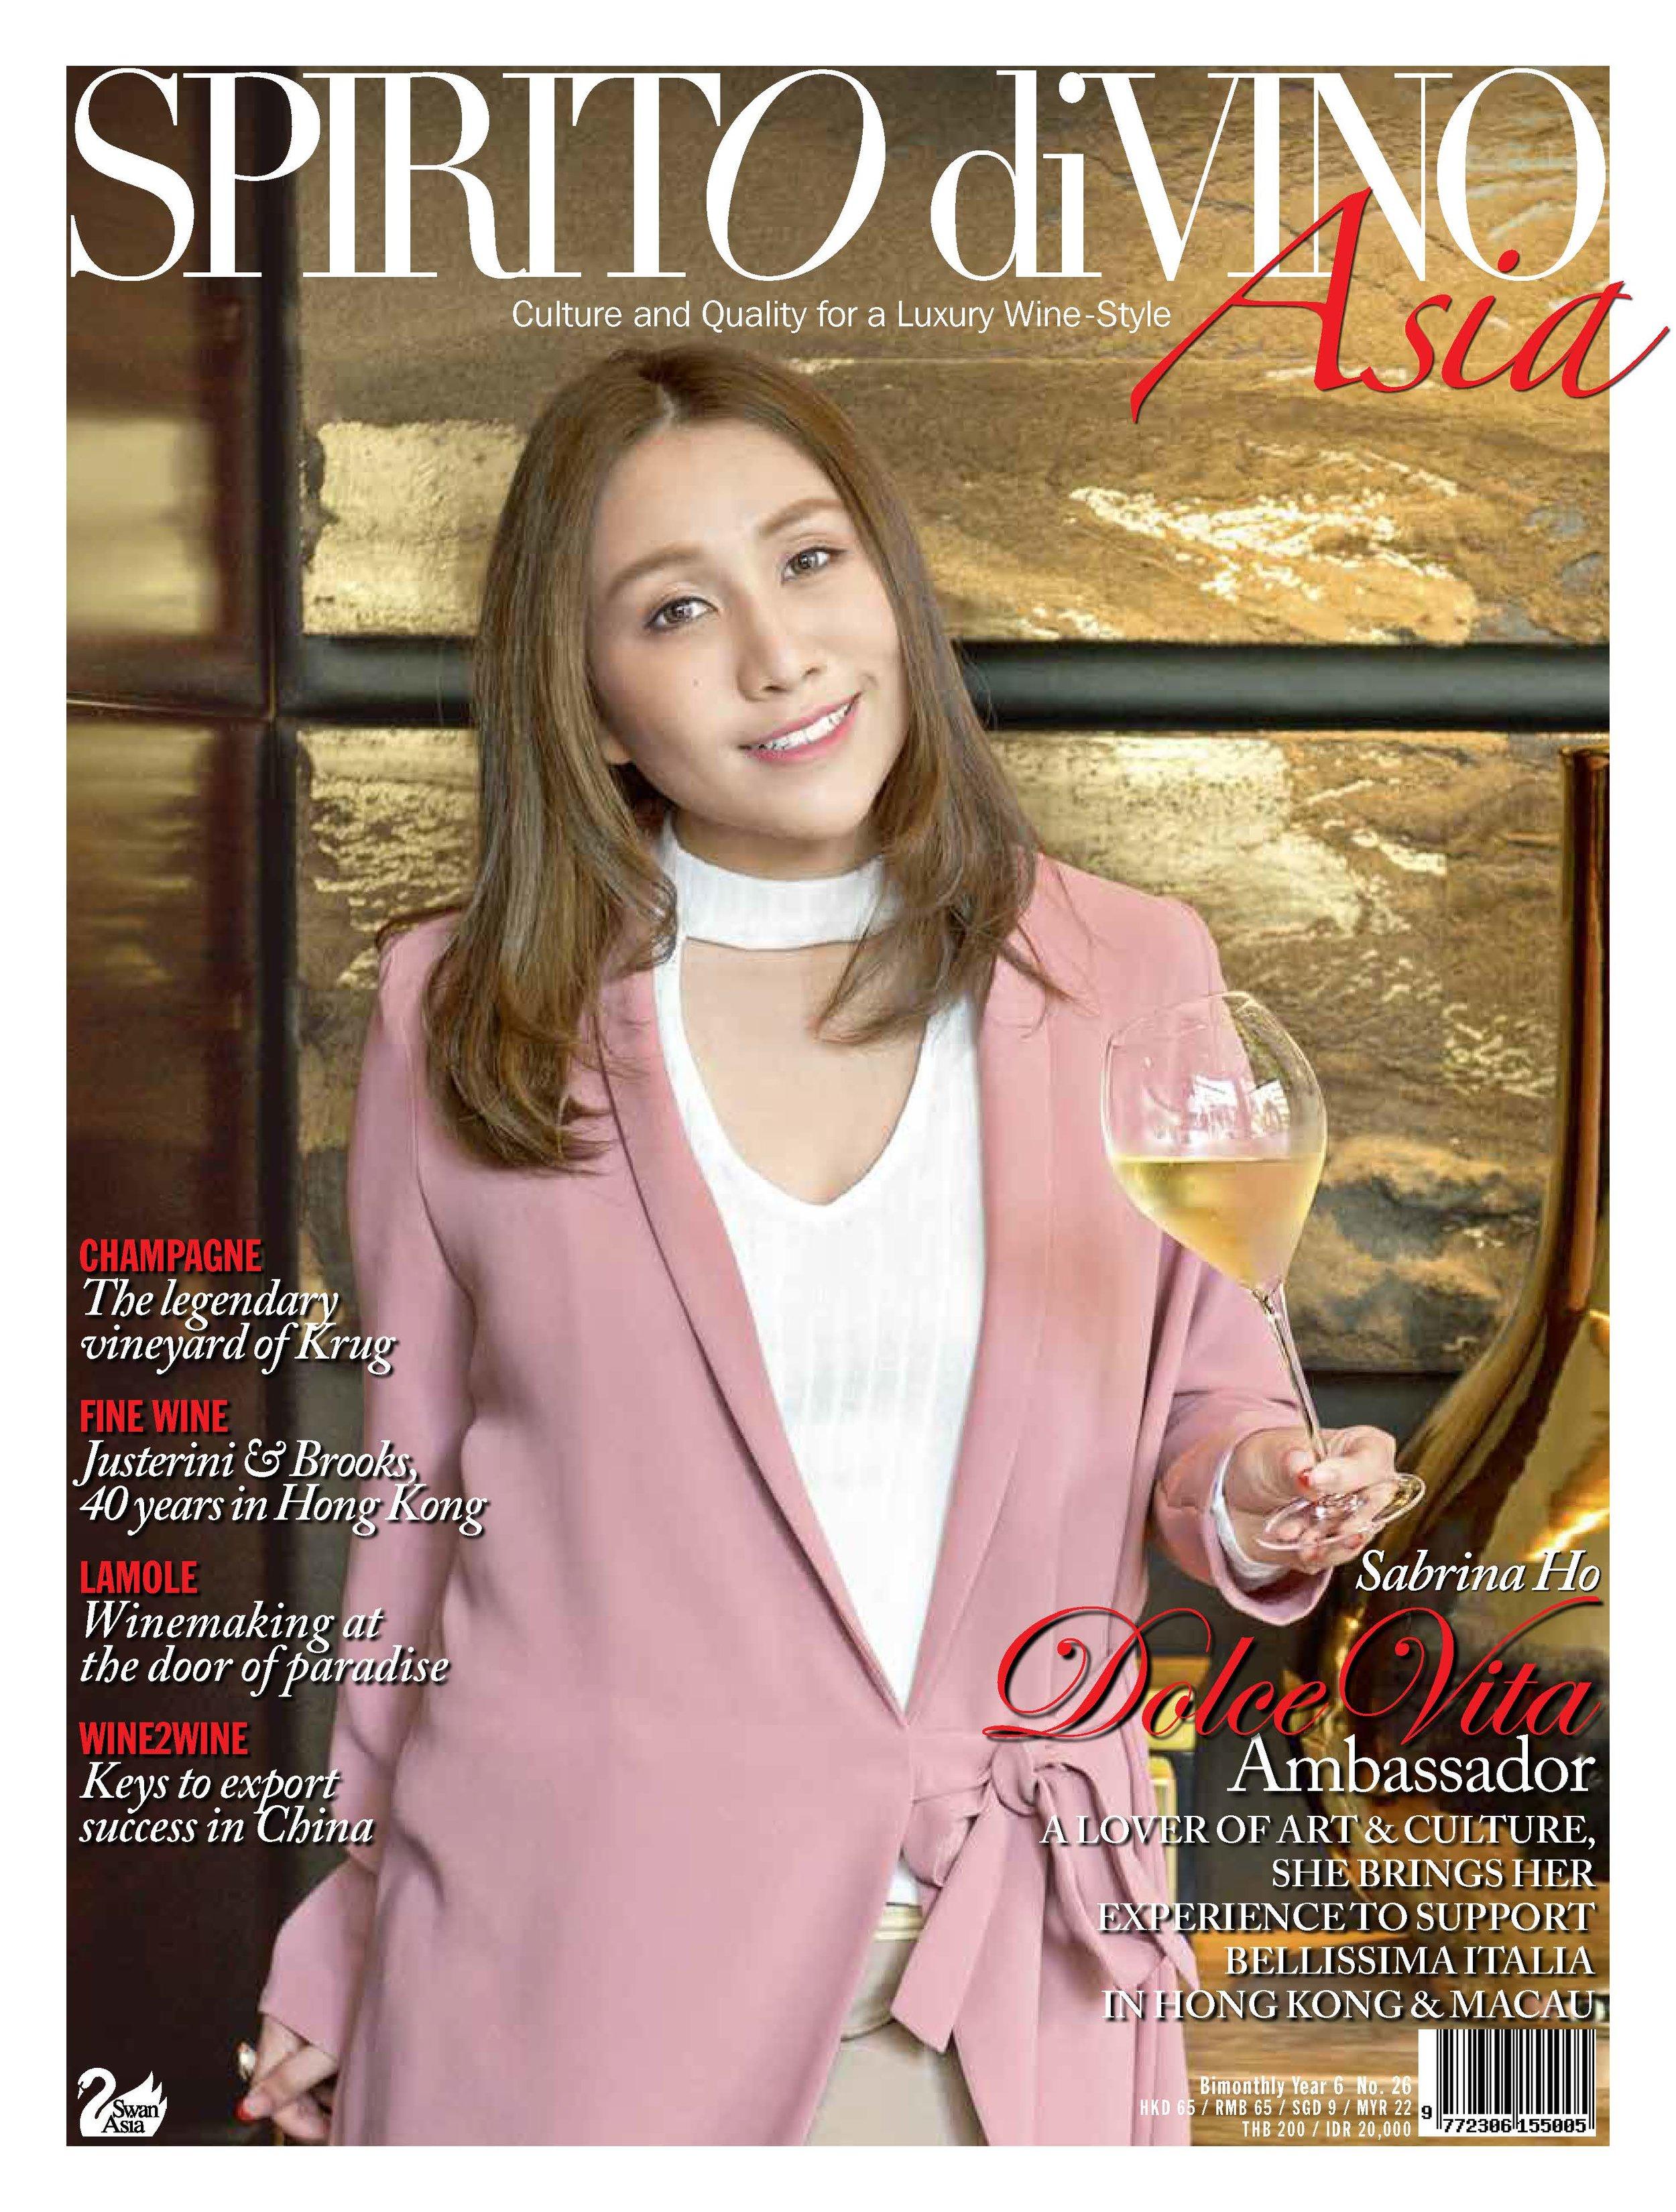 050-053_wine2wine2_asia_Page_1.jpg